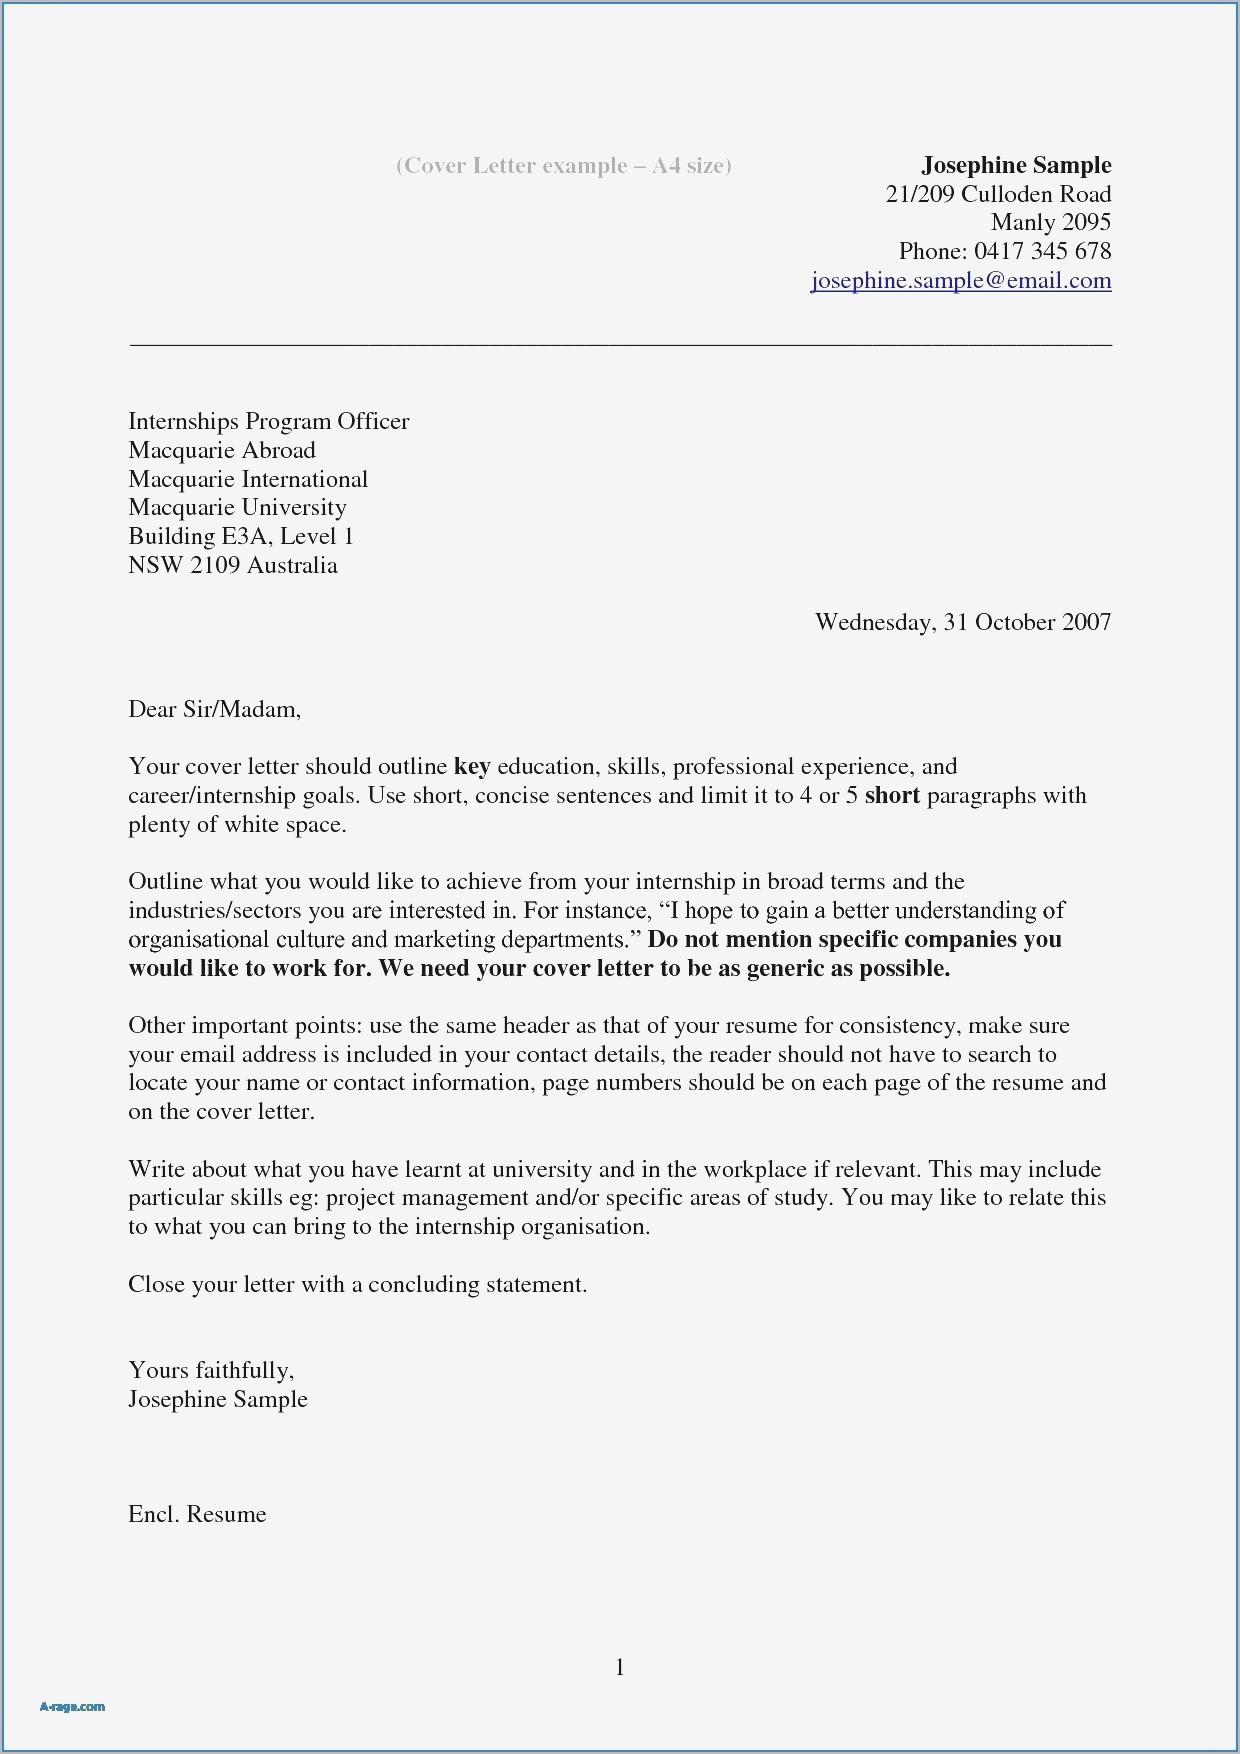 Blank Santa Letter Template - Awesome Blank Santa Letter Template